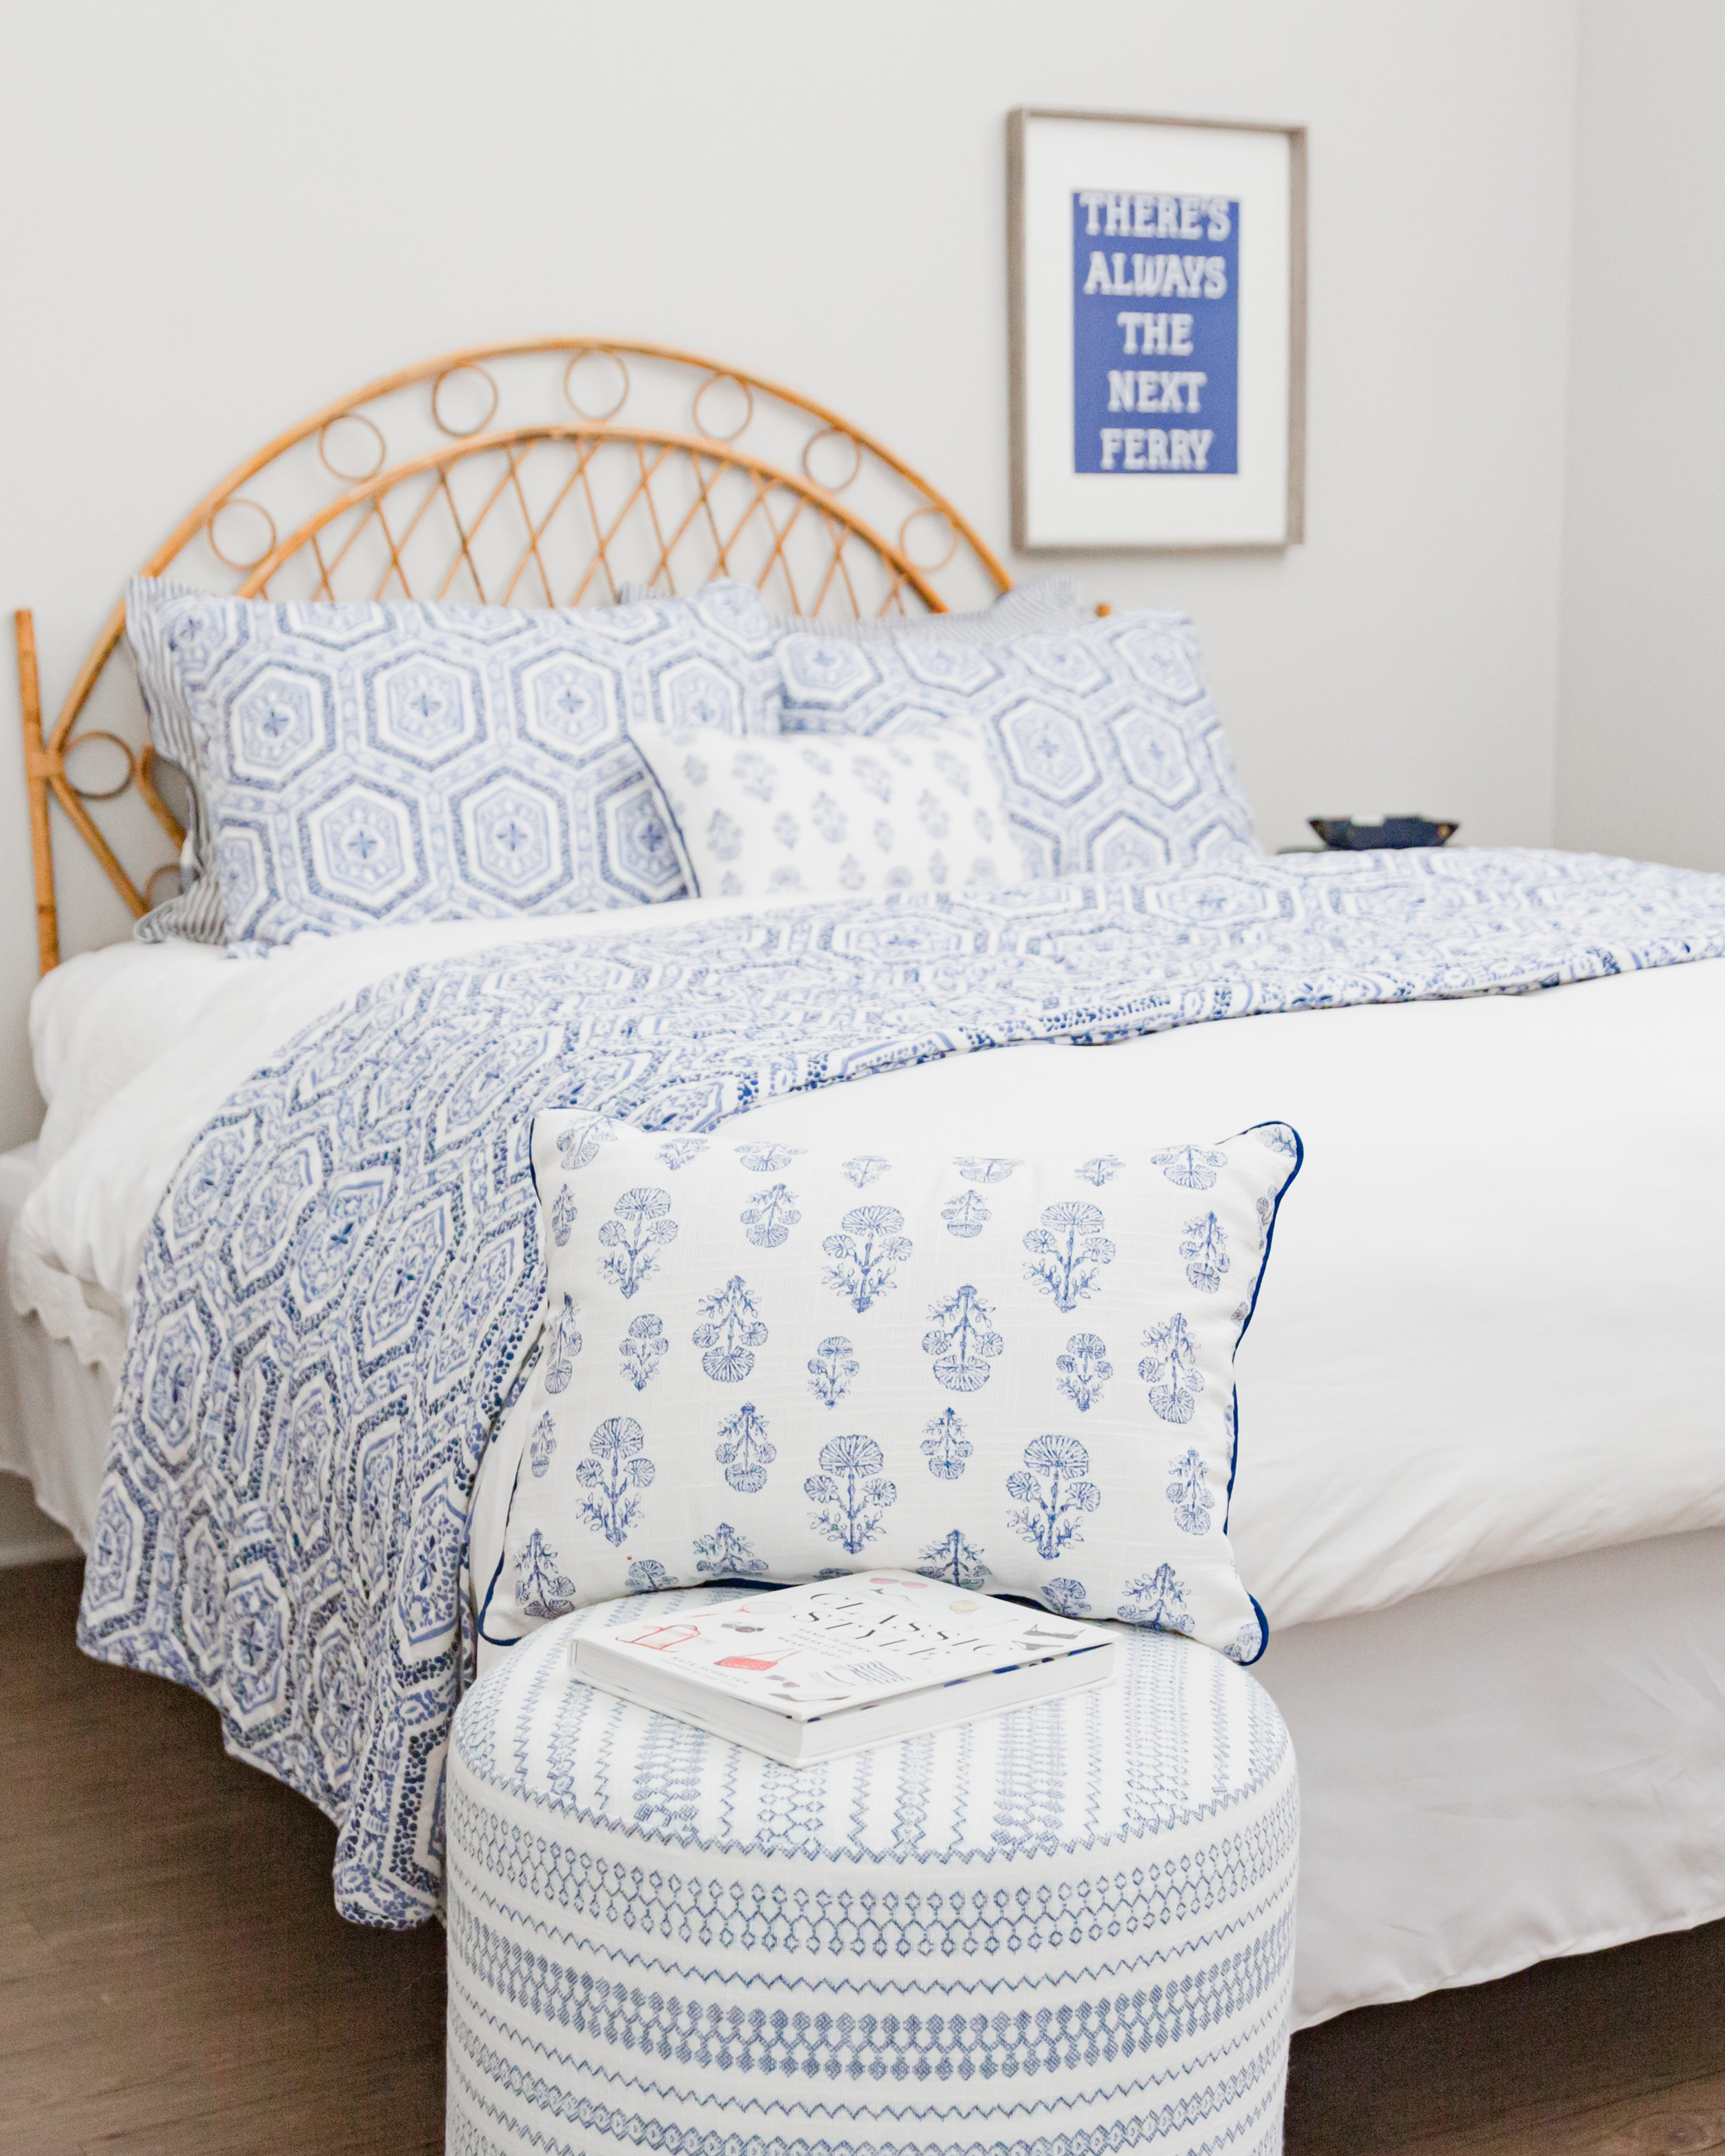 Charleston interior design for short term rental appeal